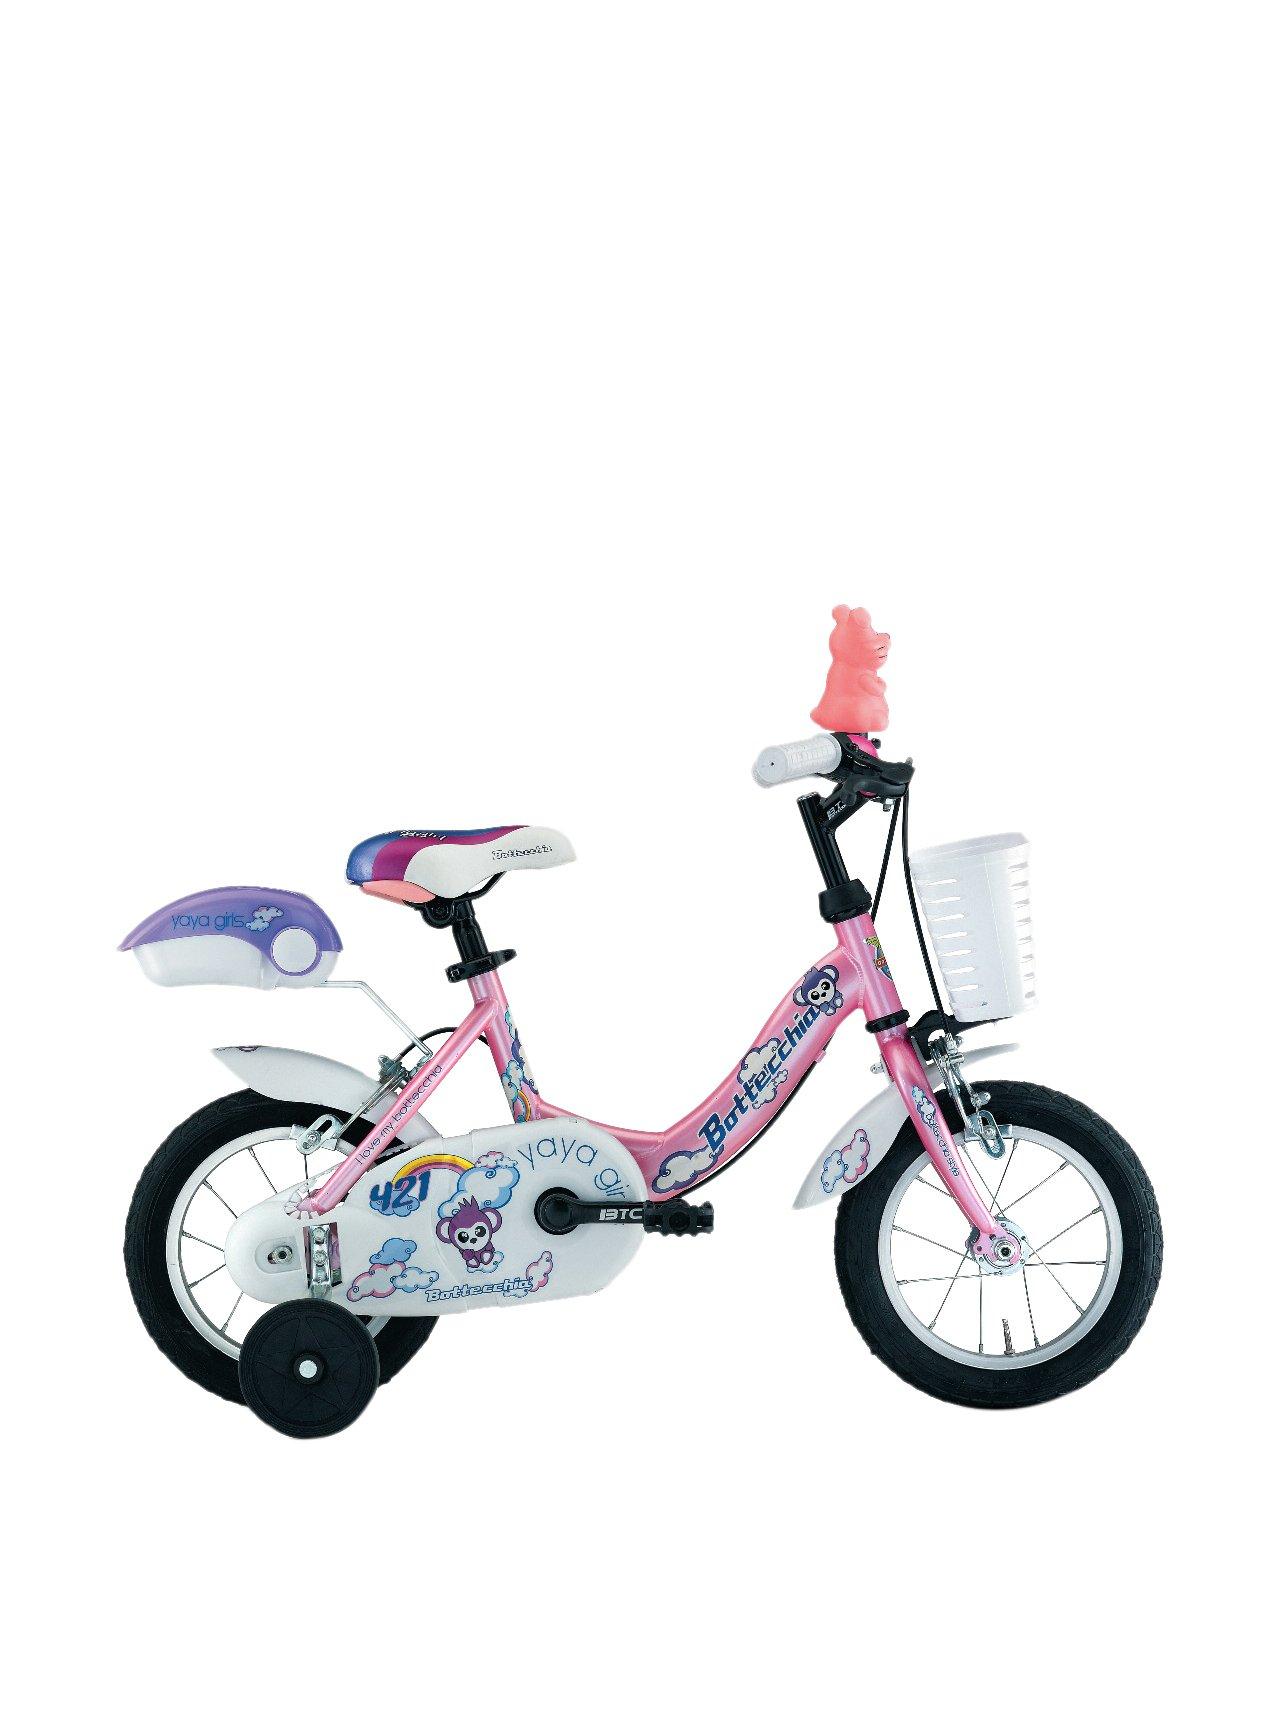 Bottecchia Bicicleta 420 MTB 12 D. Rosa: Amazon.es: Deportes y aire libre